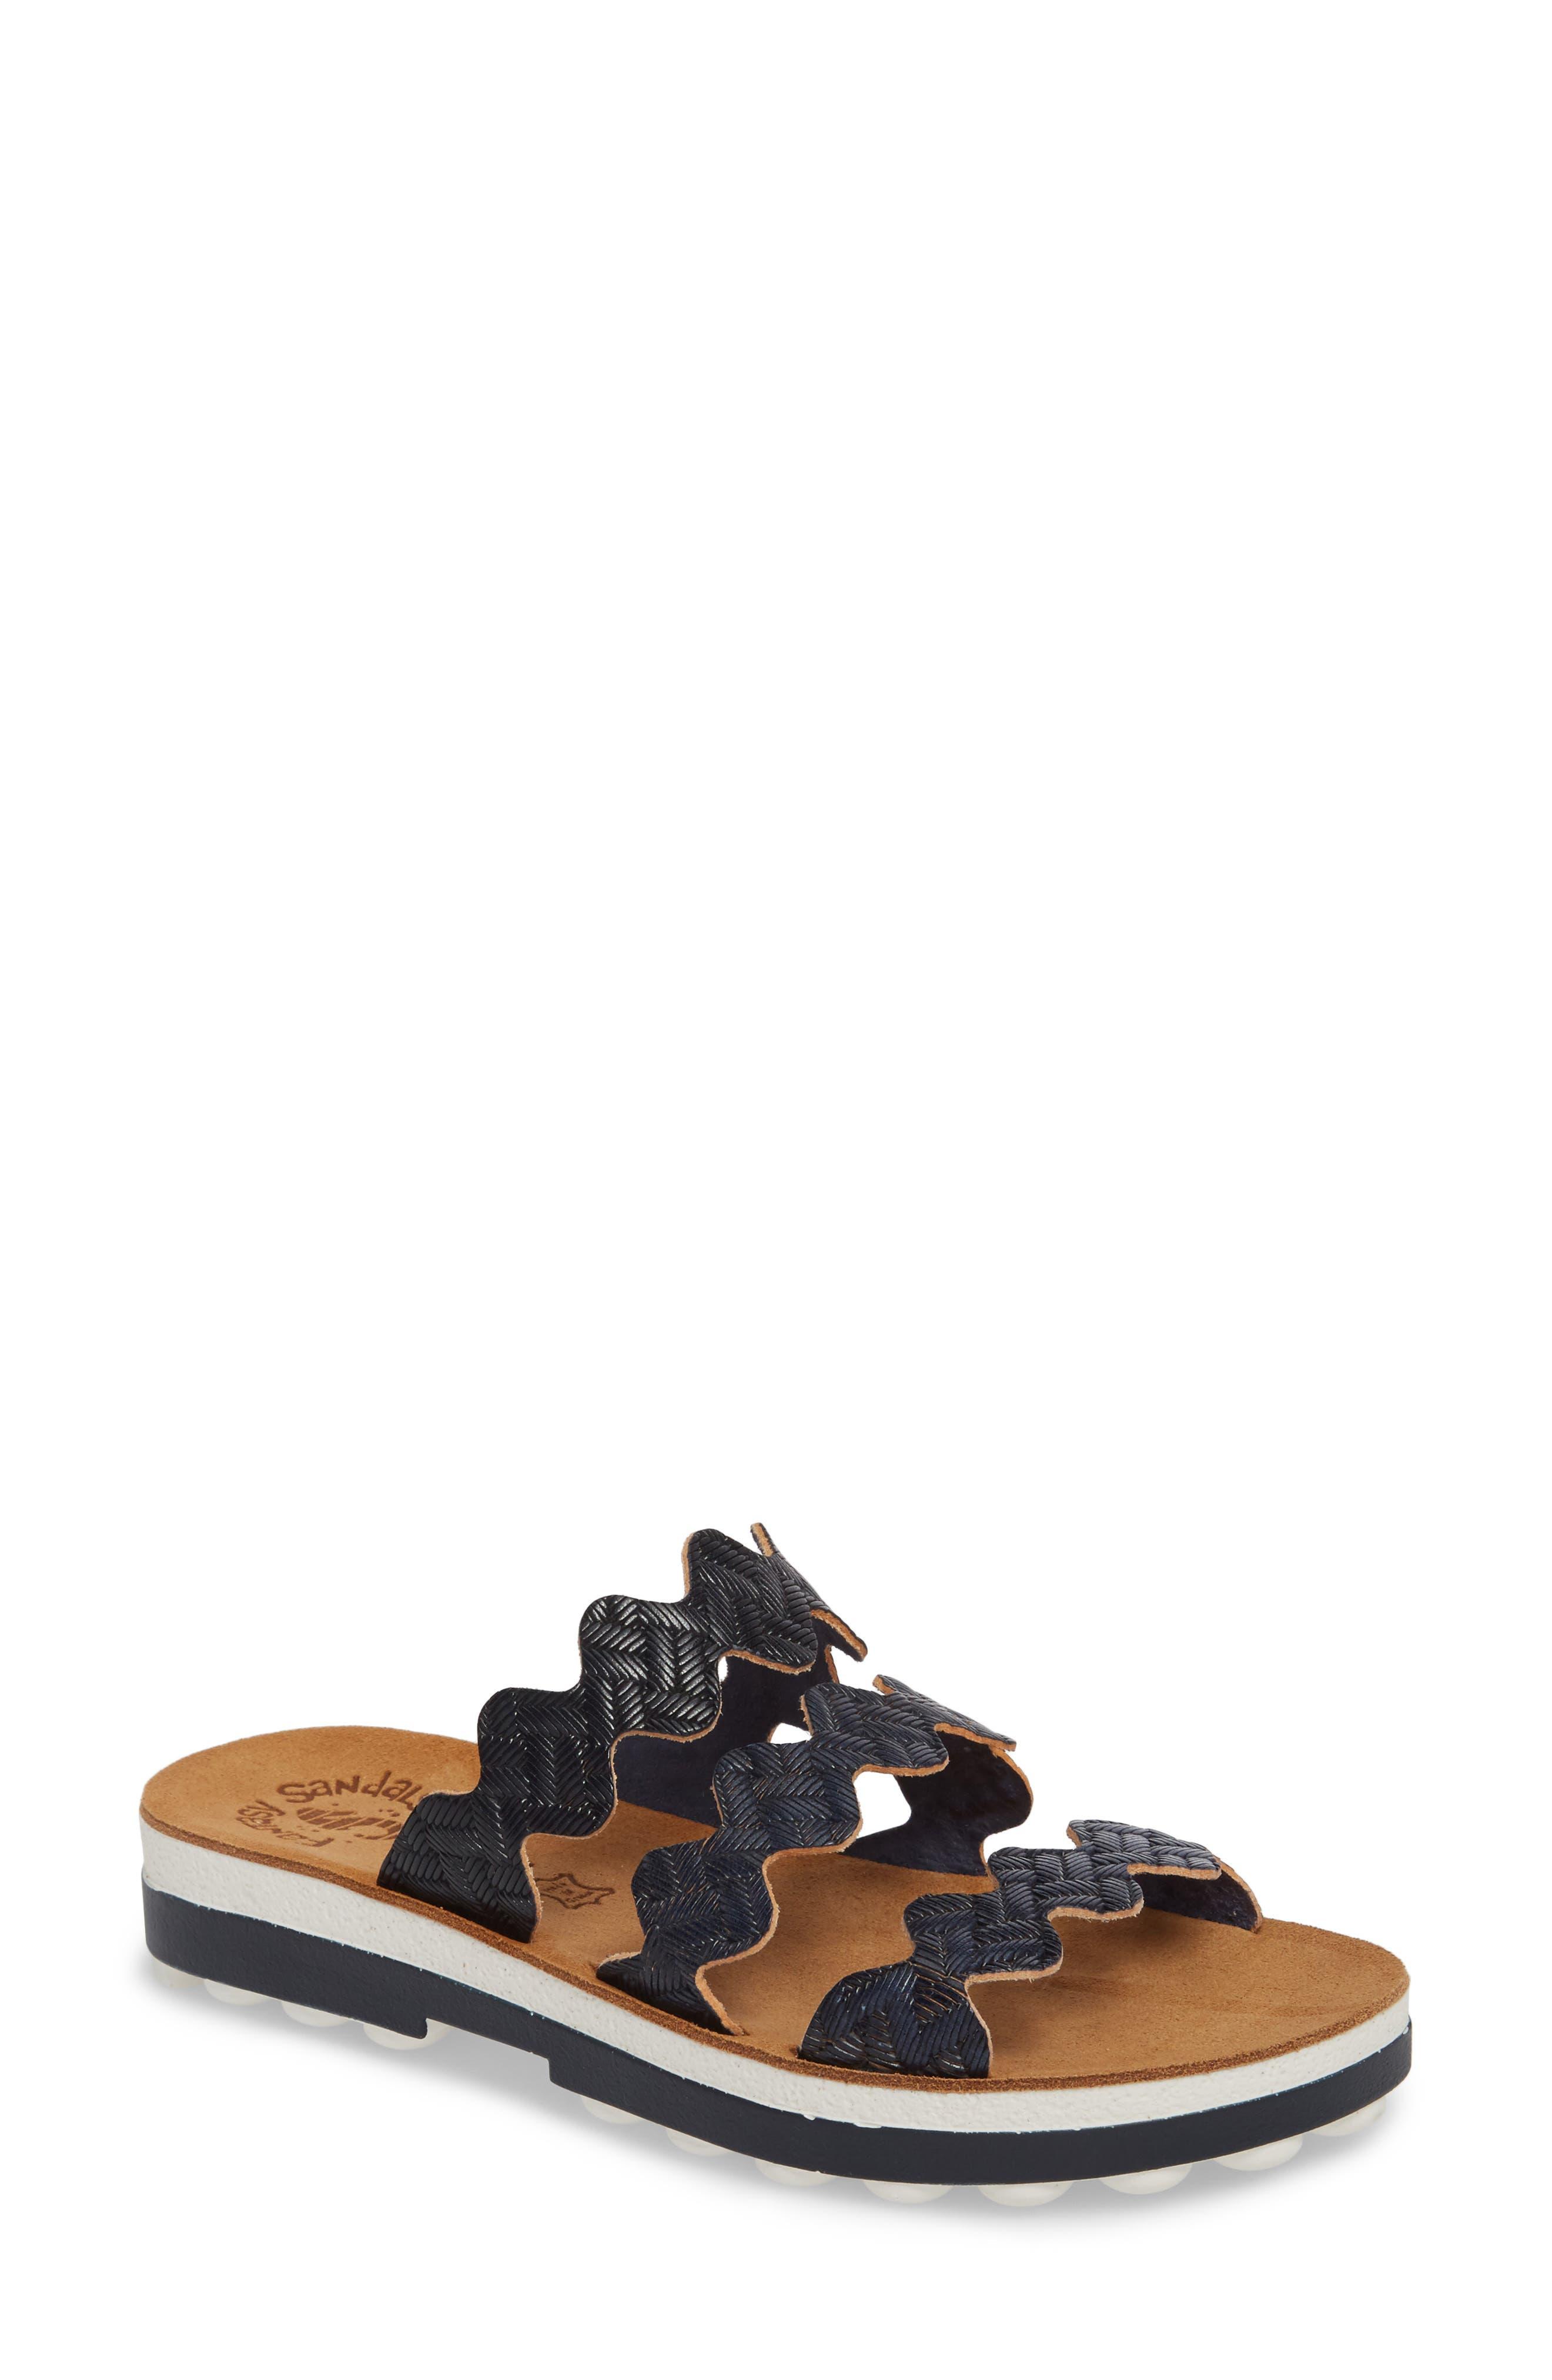 Main Image - Fantasy Sandals Waves Slide Sandal (Women)